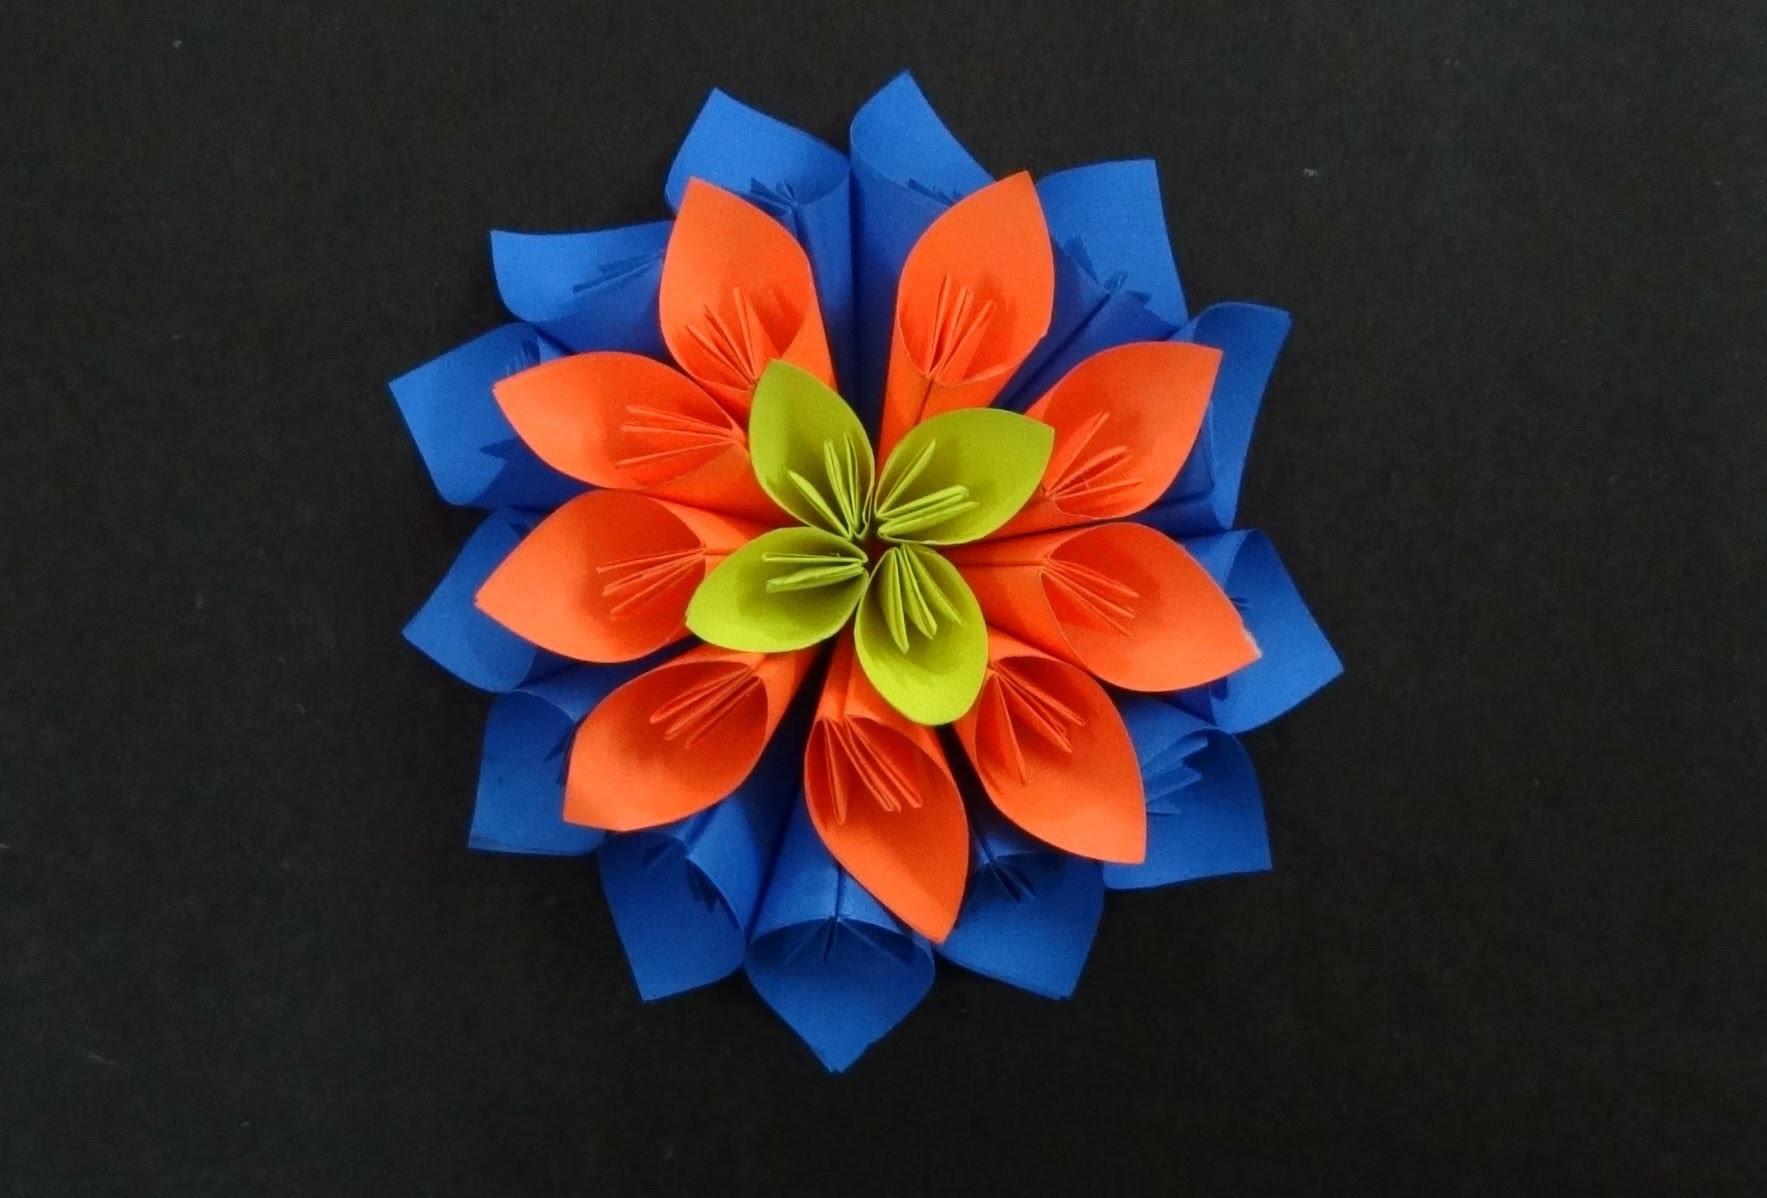 Paper Flower Tutorial: How to make a Kusudama Flower